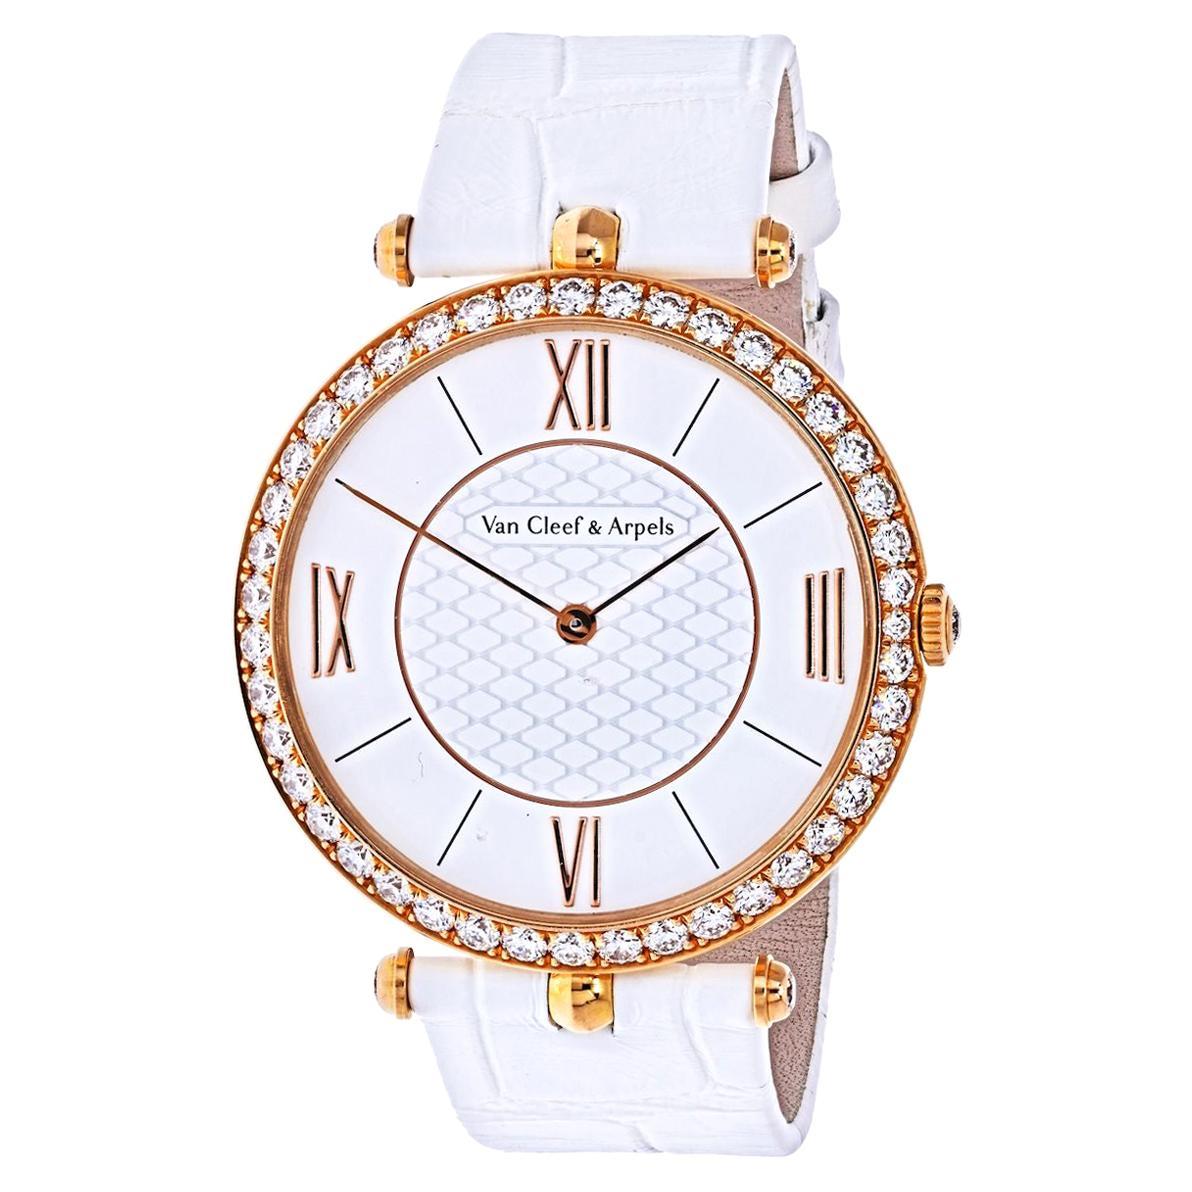 Van Cleef & Arpels 18K Rose Gold VCAR03GL00 Diamond Bezel Watch